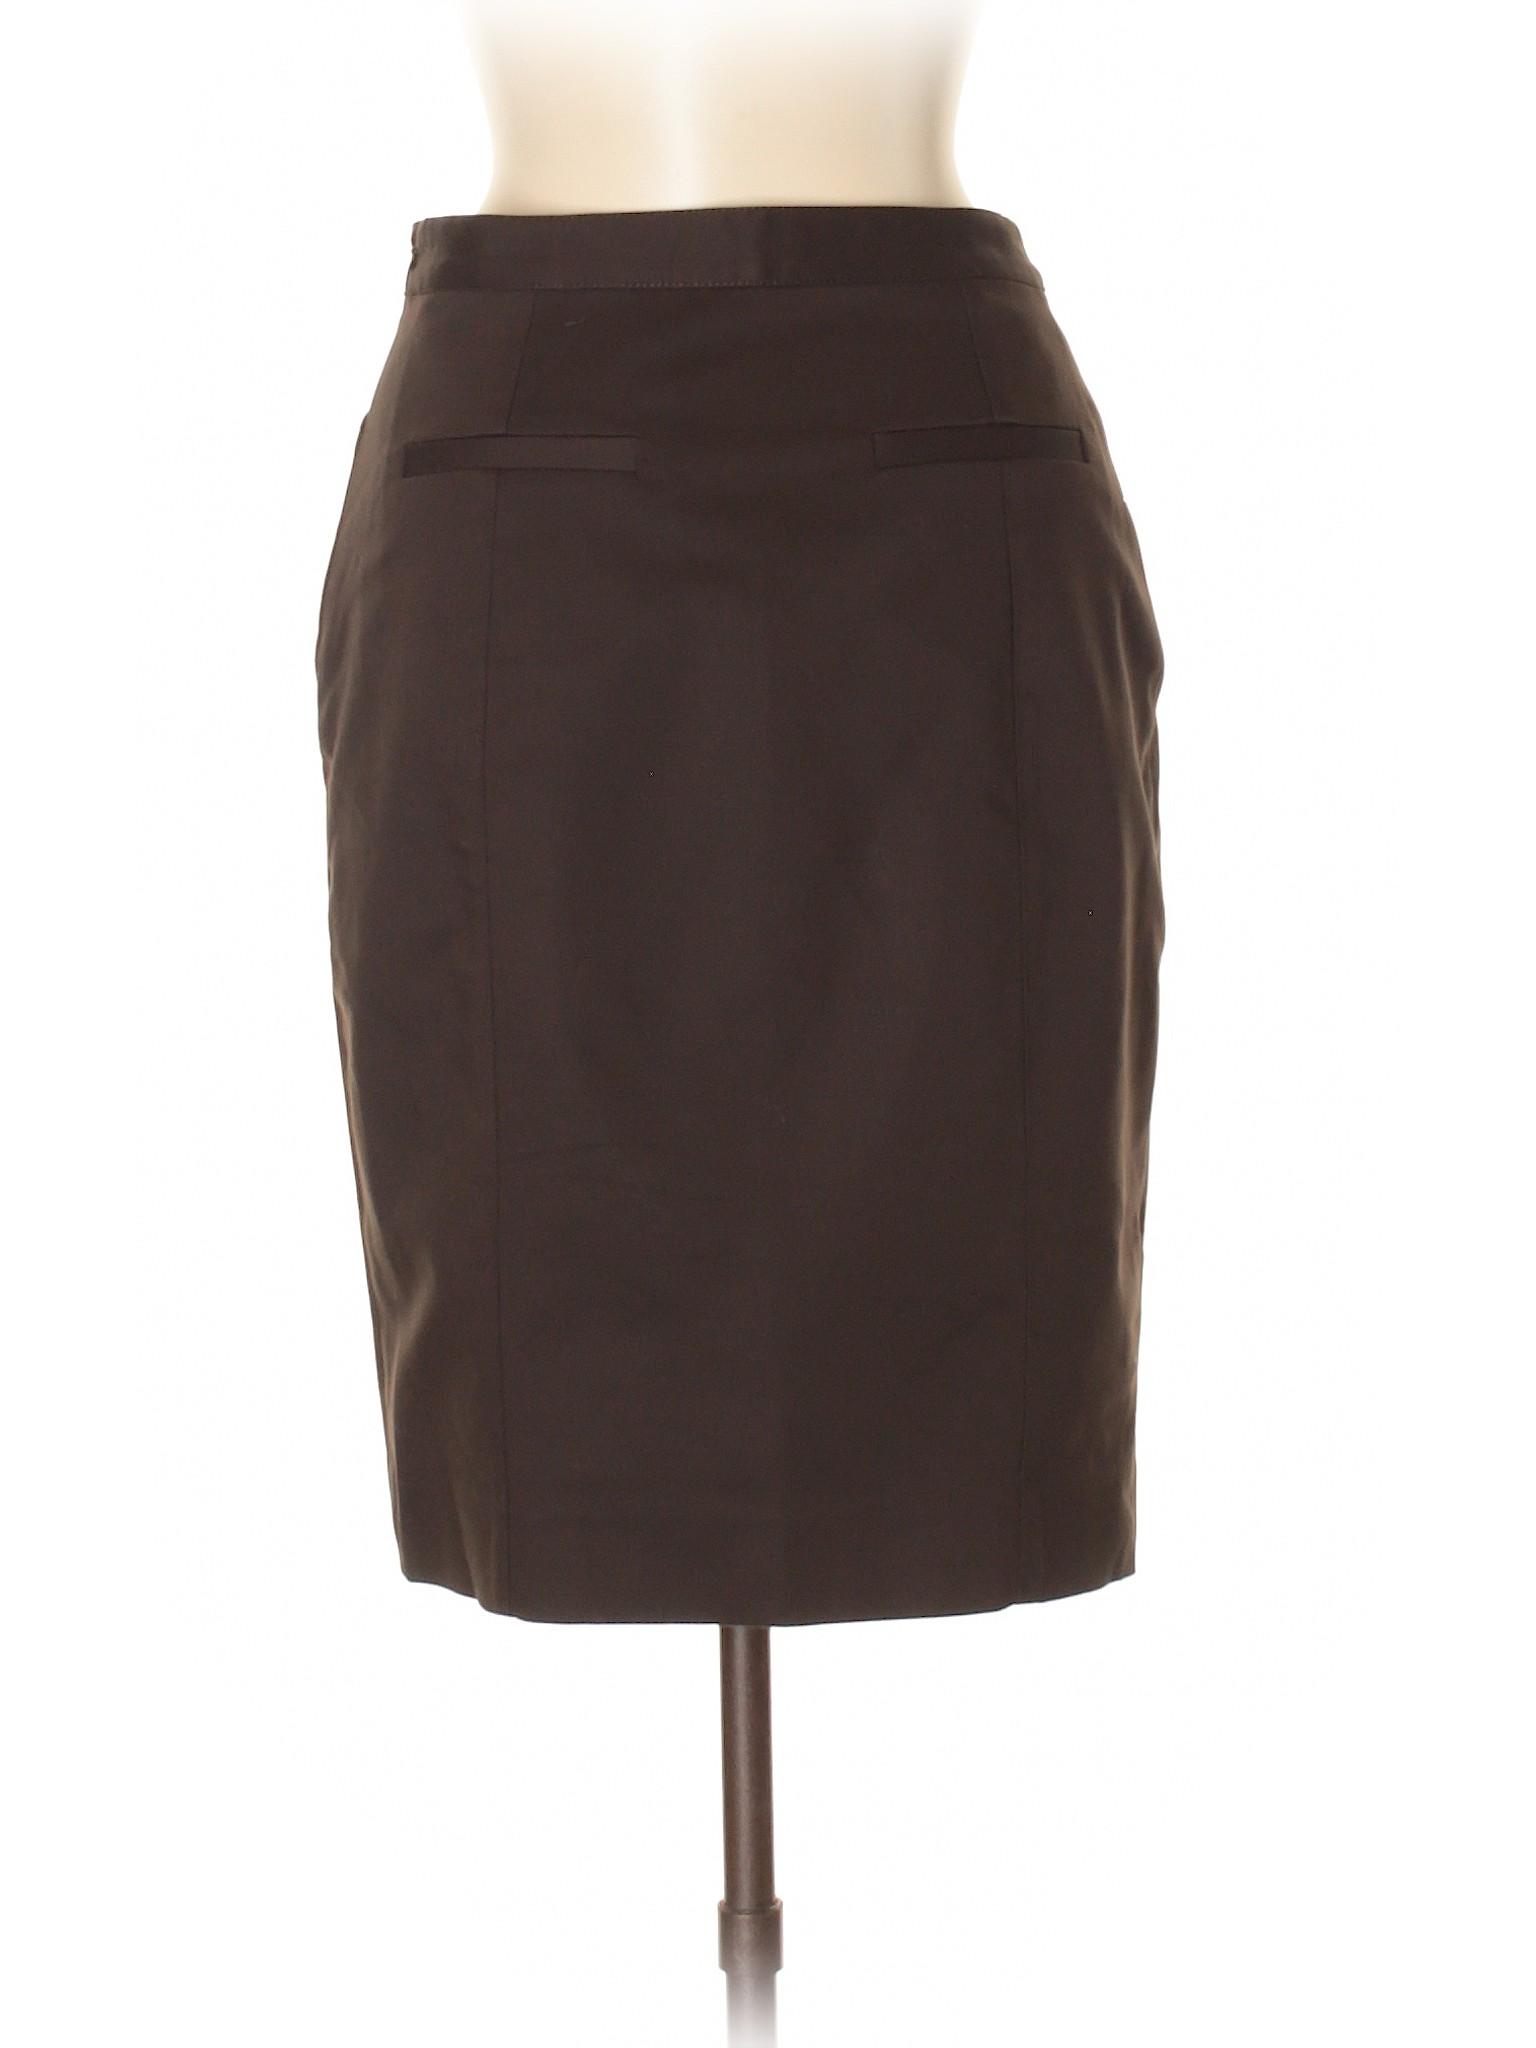 leisure Skirt Monaco Casual Club Boutique 7wx8Hq8F